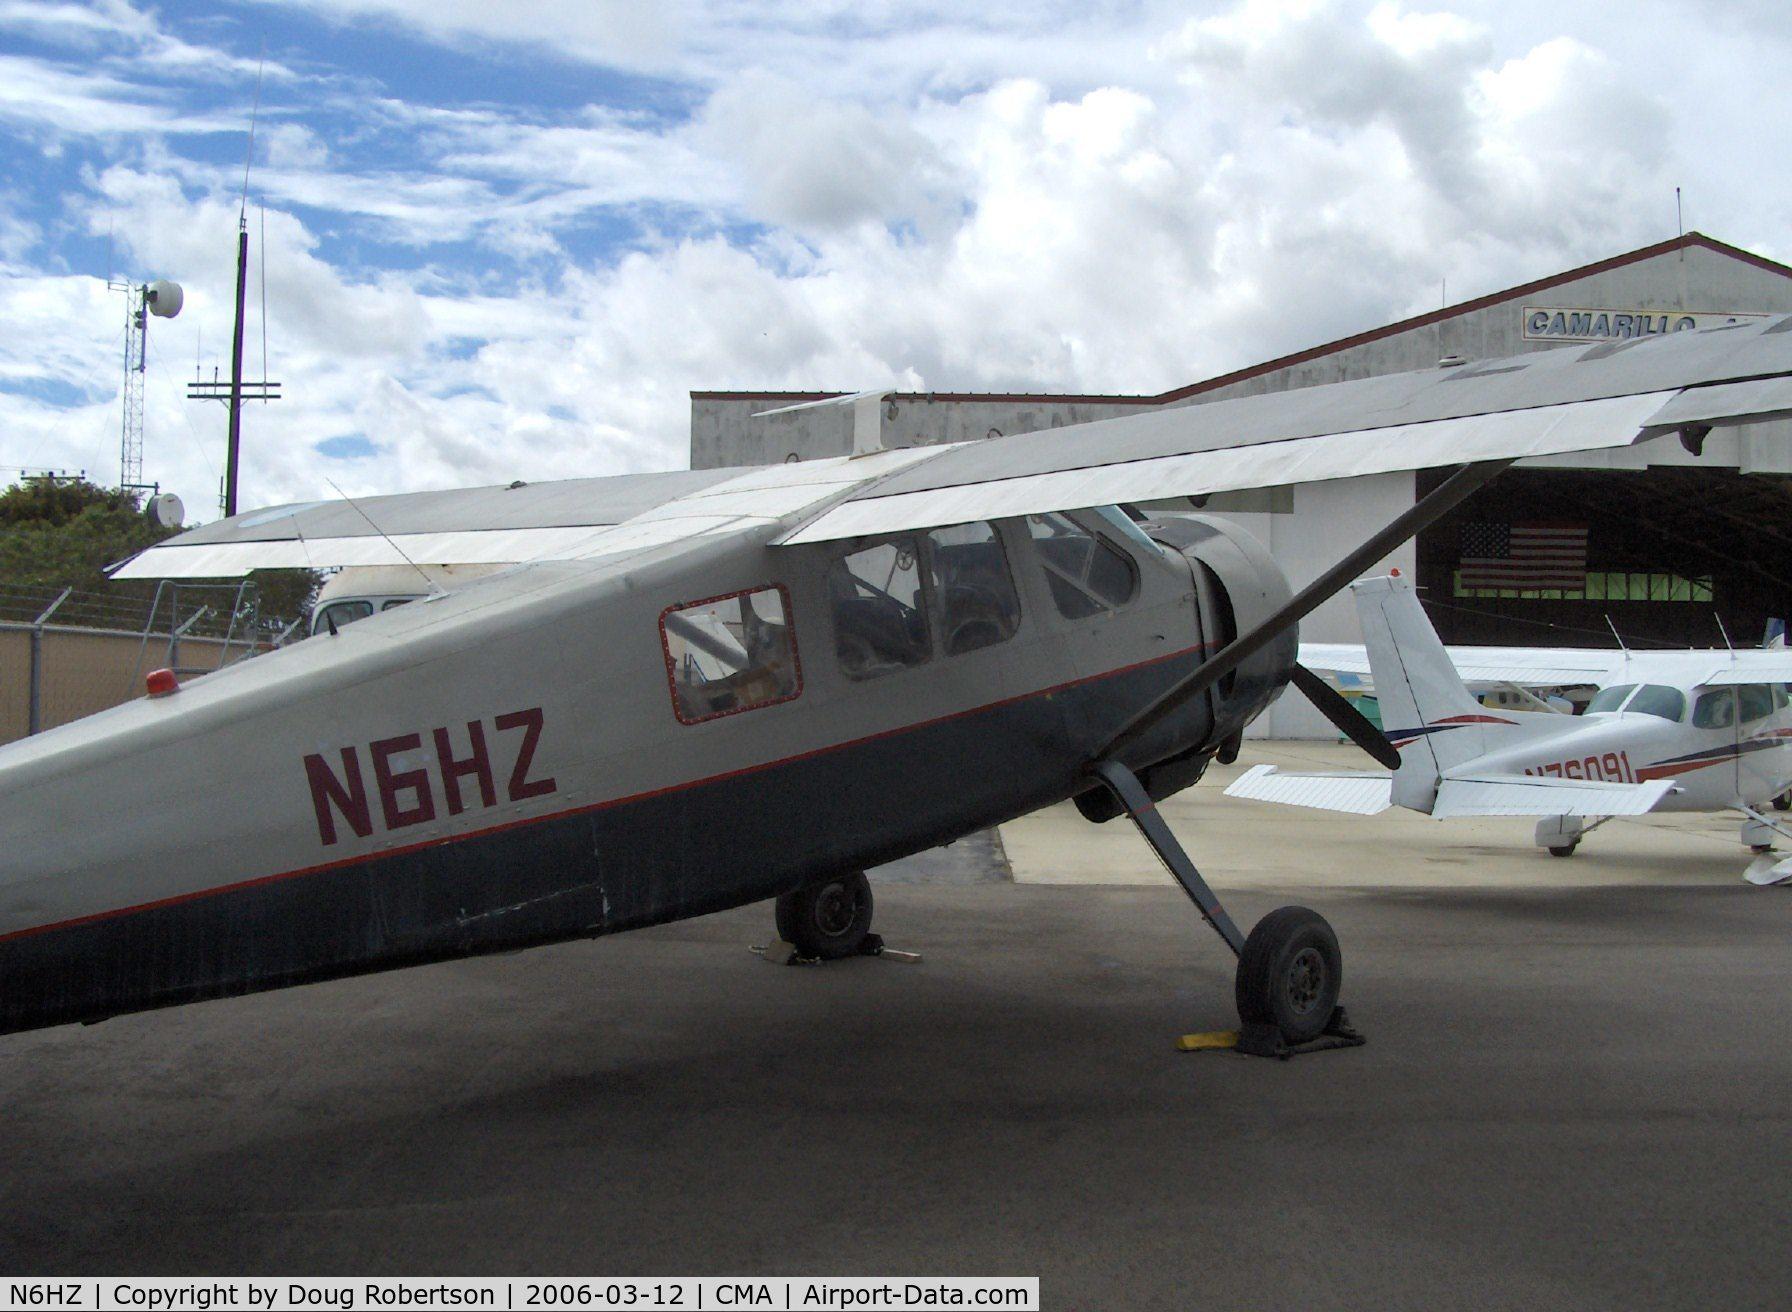 N6HZ, Max Holste MH-1521M Broussard C/N 25C, Avions Max Holste M.H.1521M BROUSSARD, P&W R-985 450 Hp, cabin cover removed